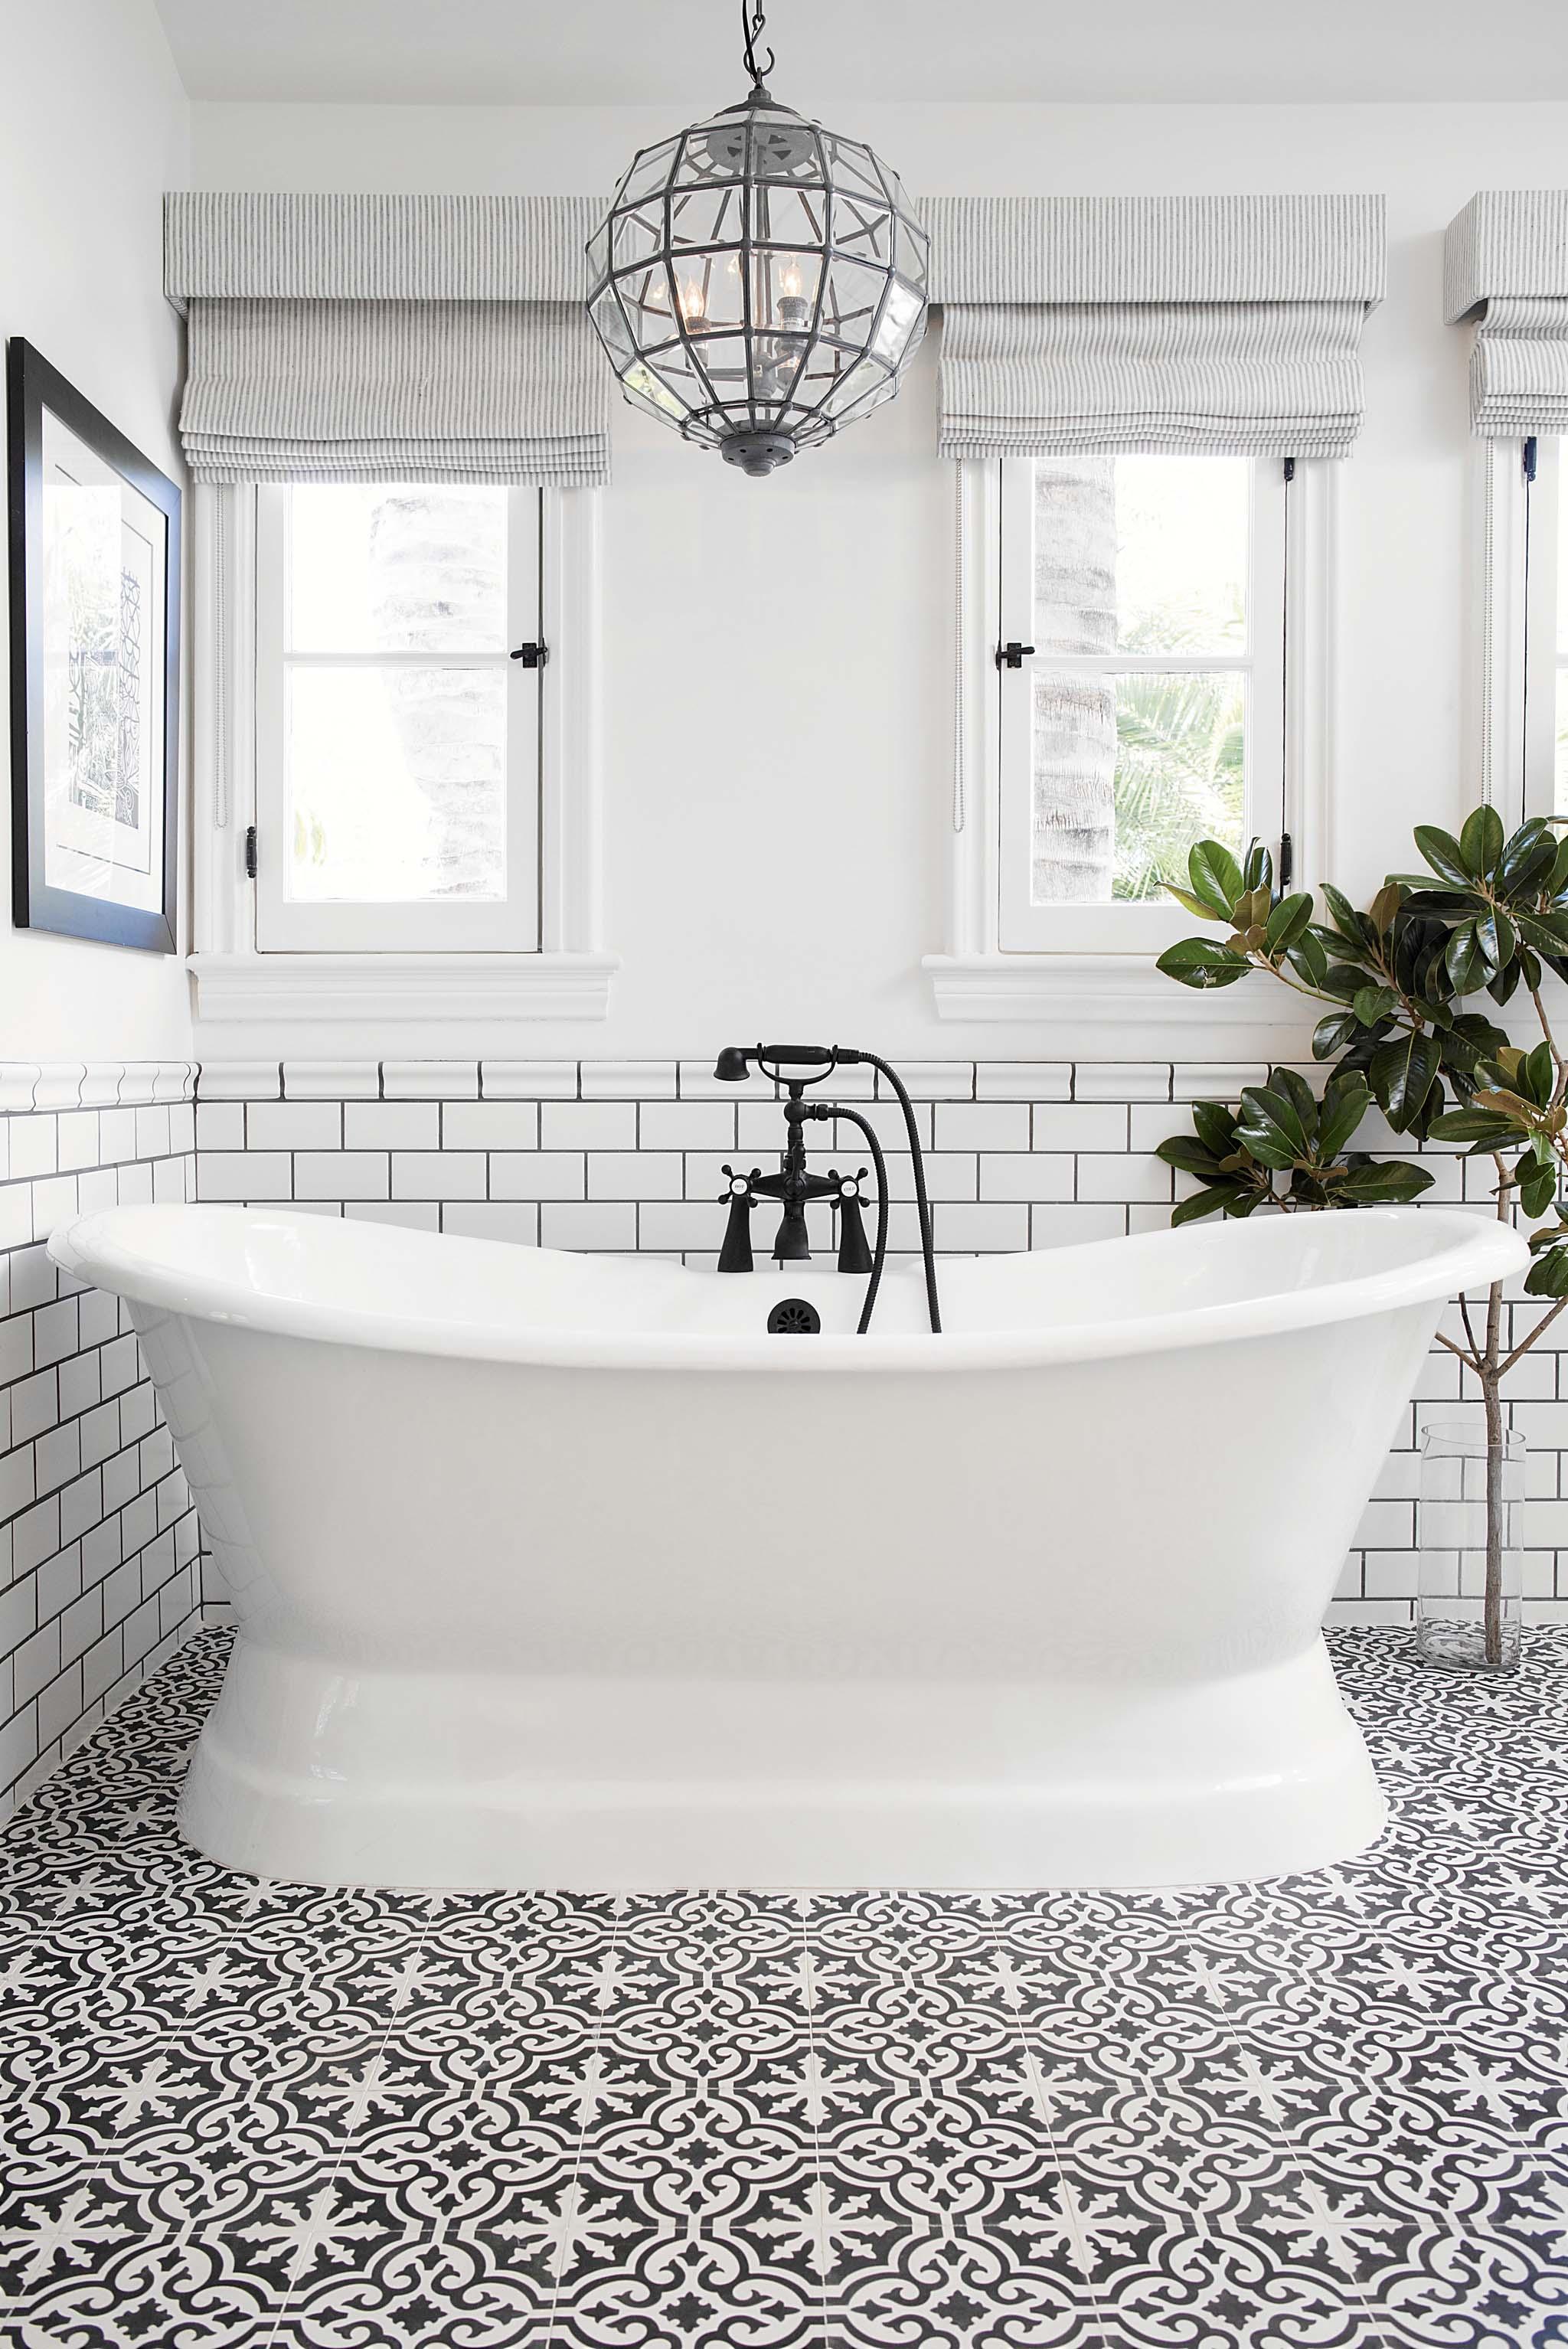 How To Get A Modern Classic Bathroom Inspiration Design Books Blog,Types Of House Interior Designs